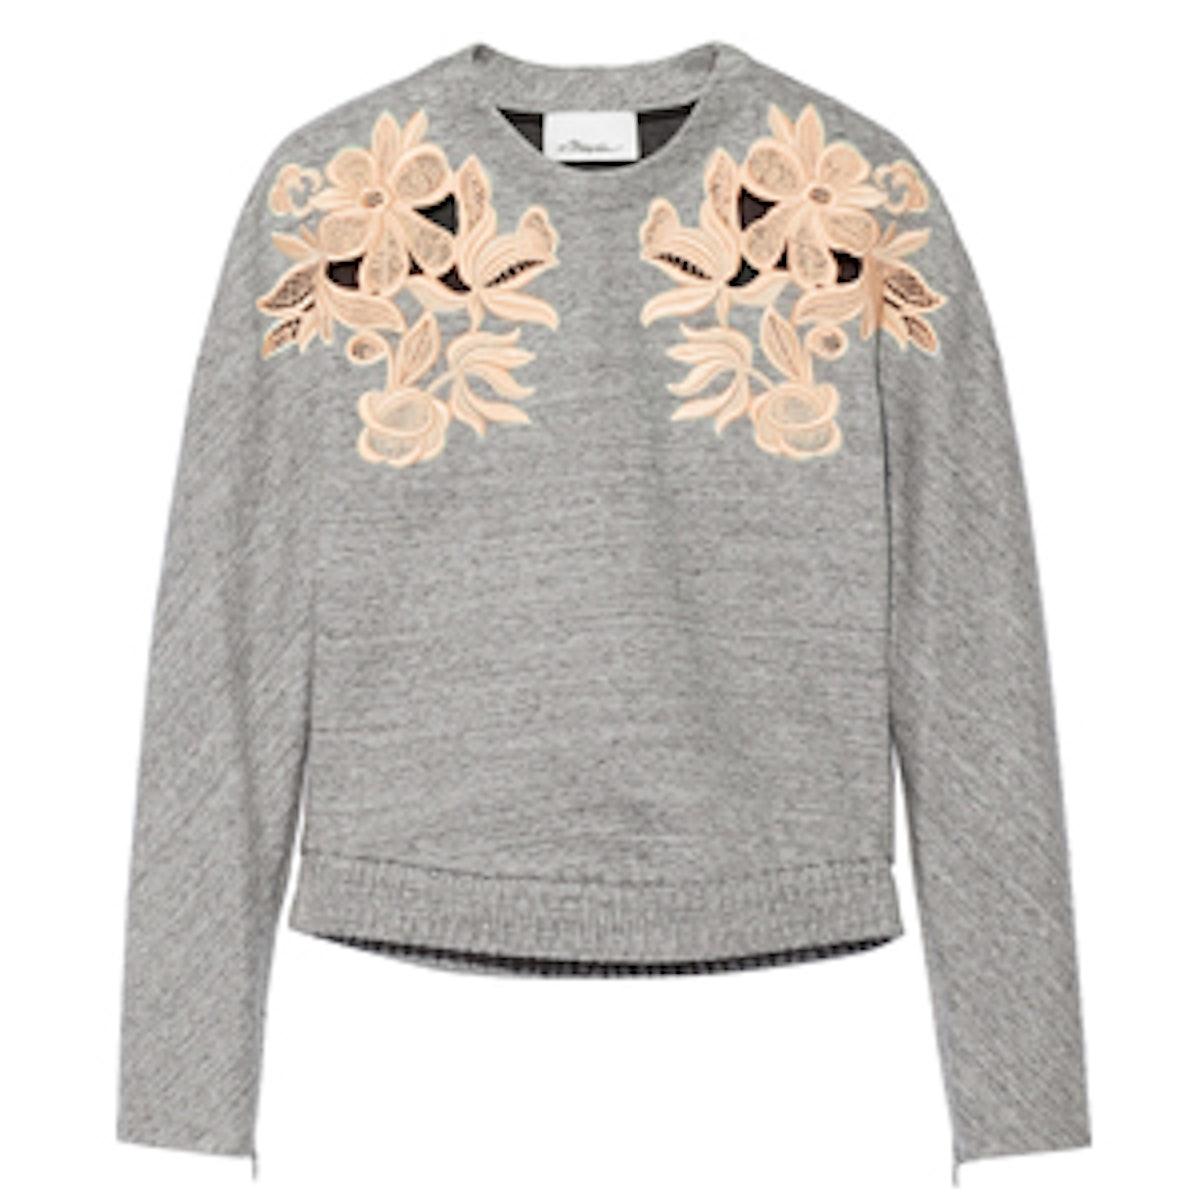 Guipure Lace Paneled Cotton Blend Sweatshirt